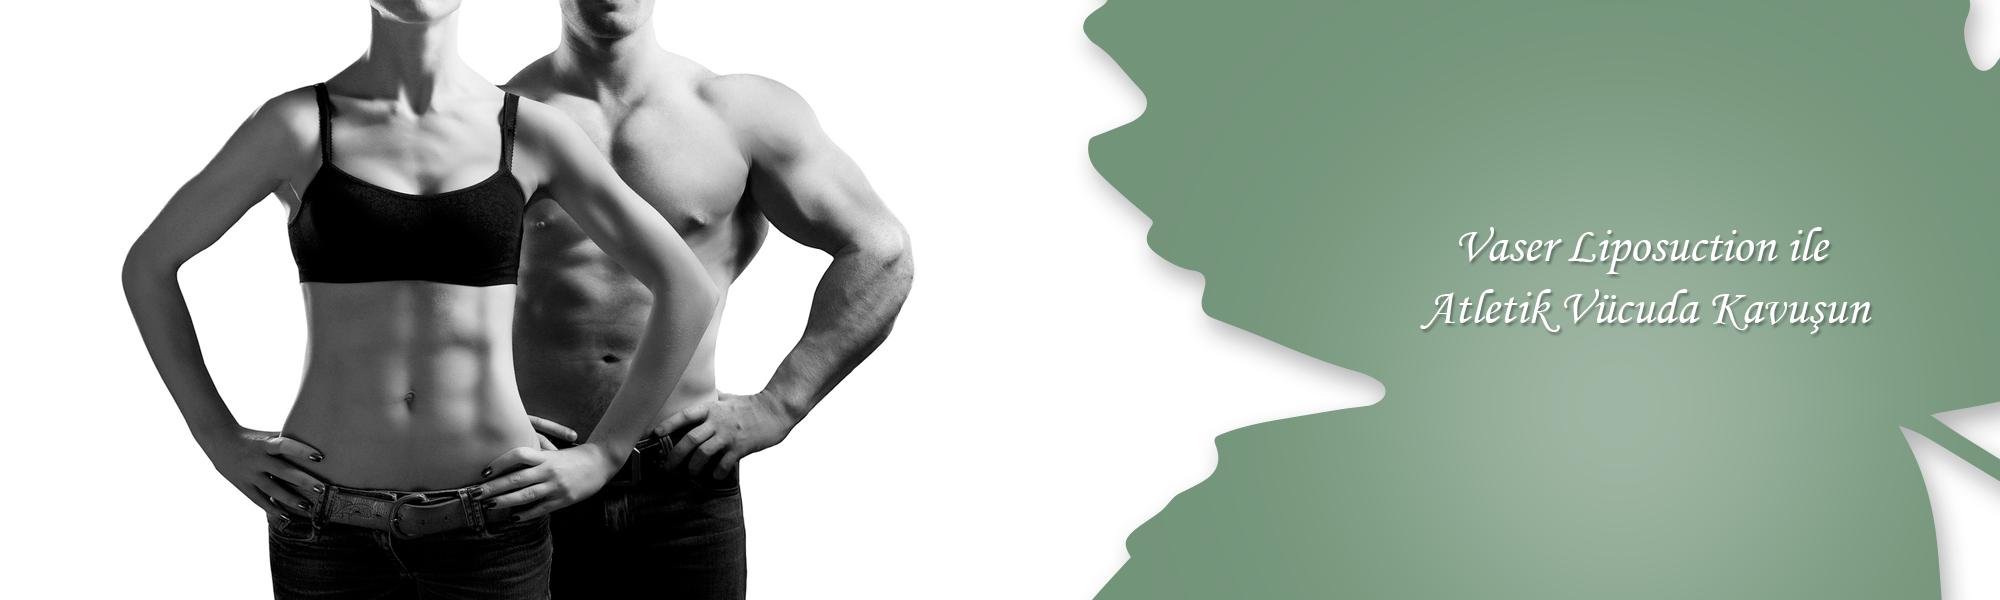 Vaser-Liposuction-ile-at